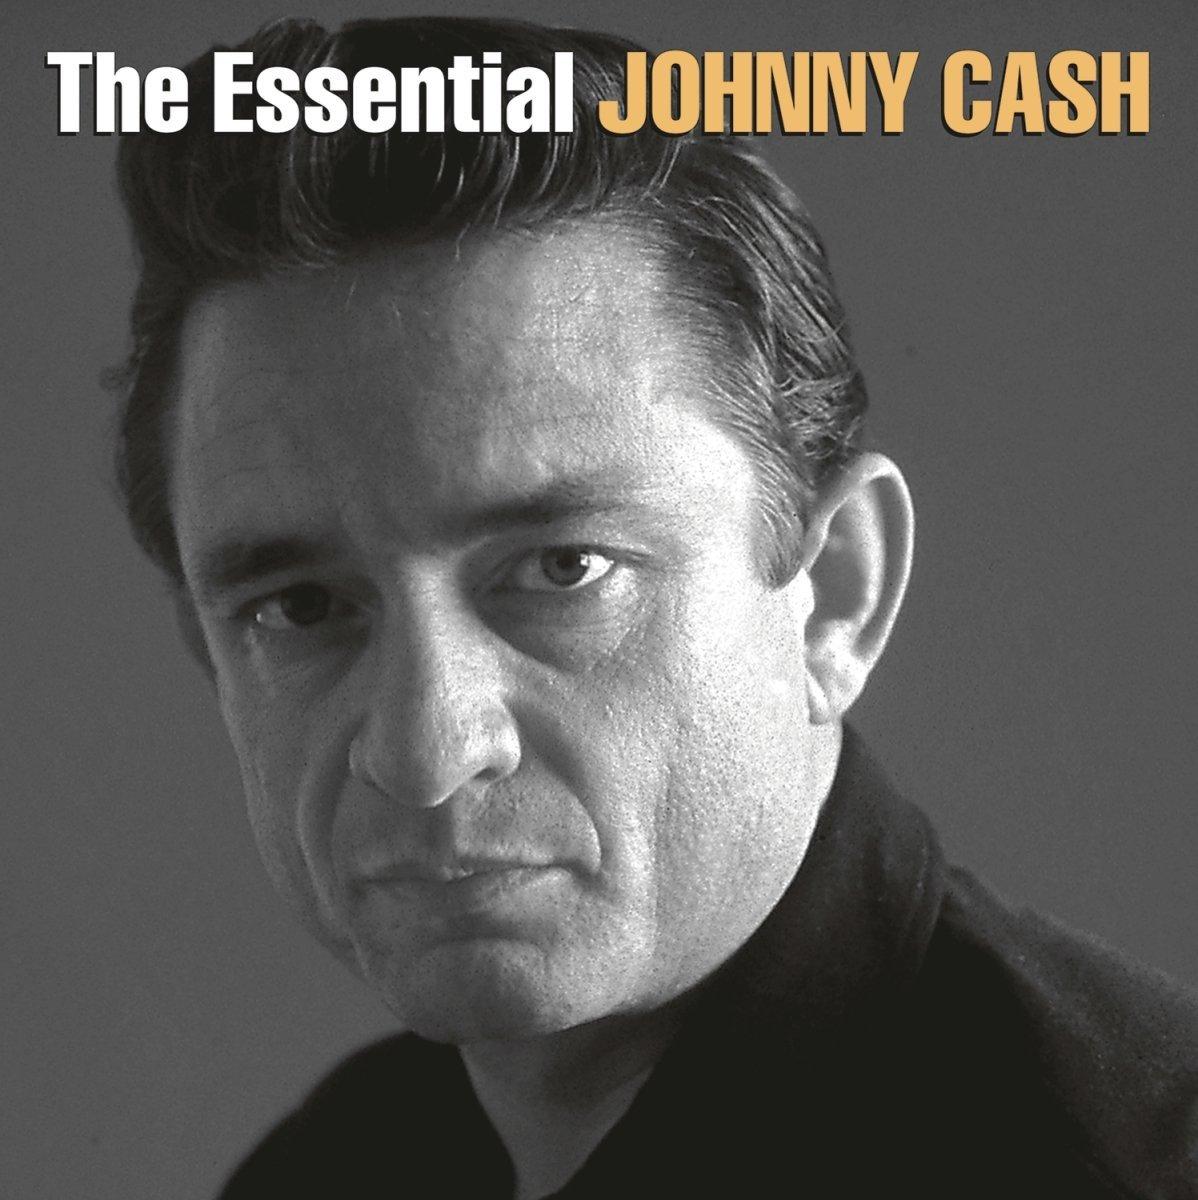 The Essential Johnny Cash - Vinyl